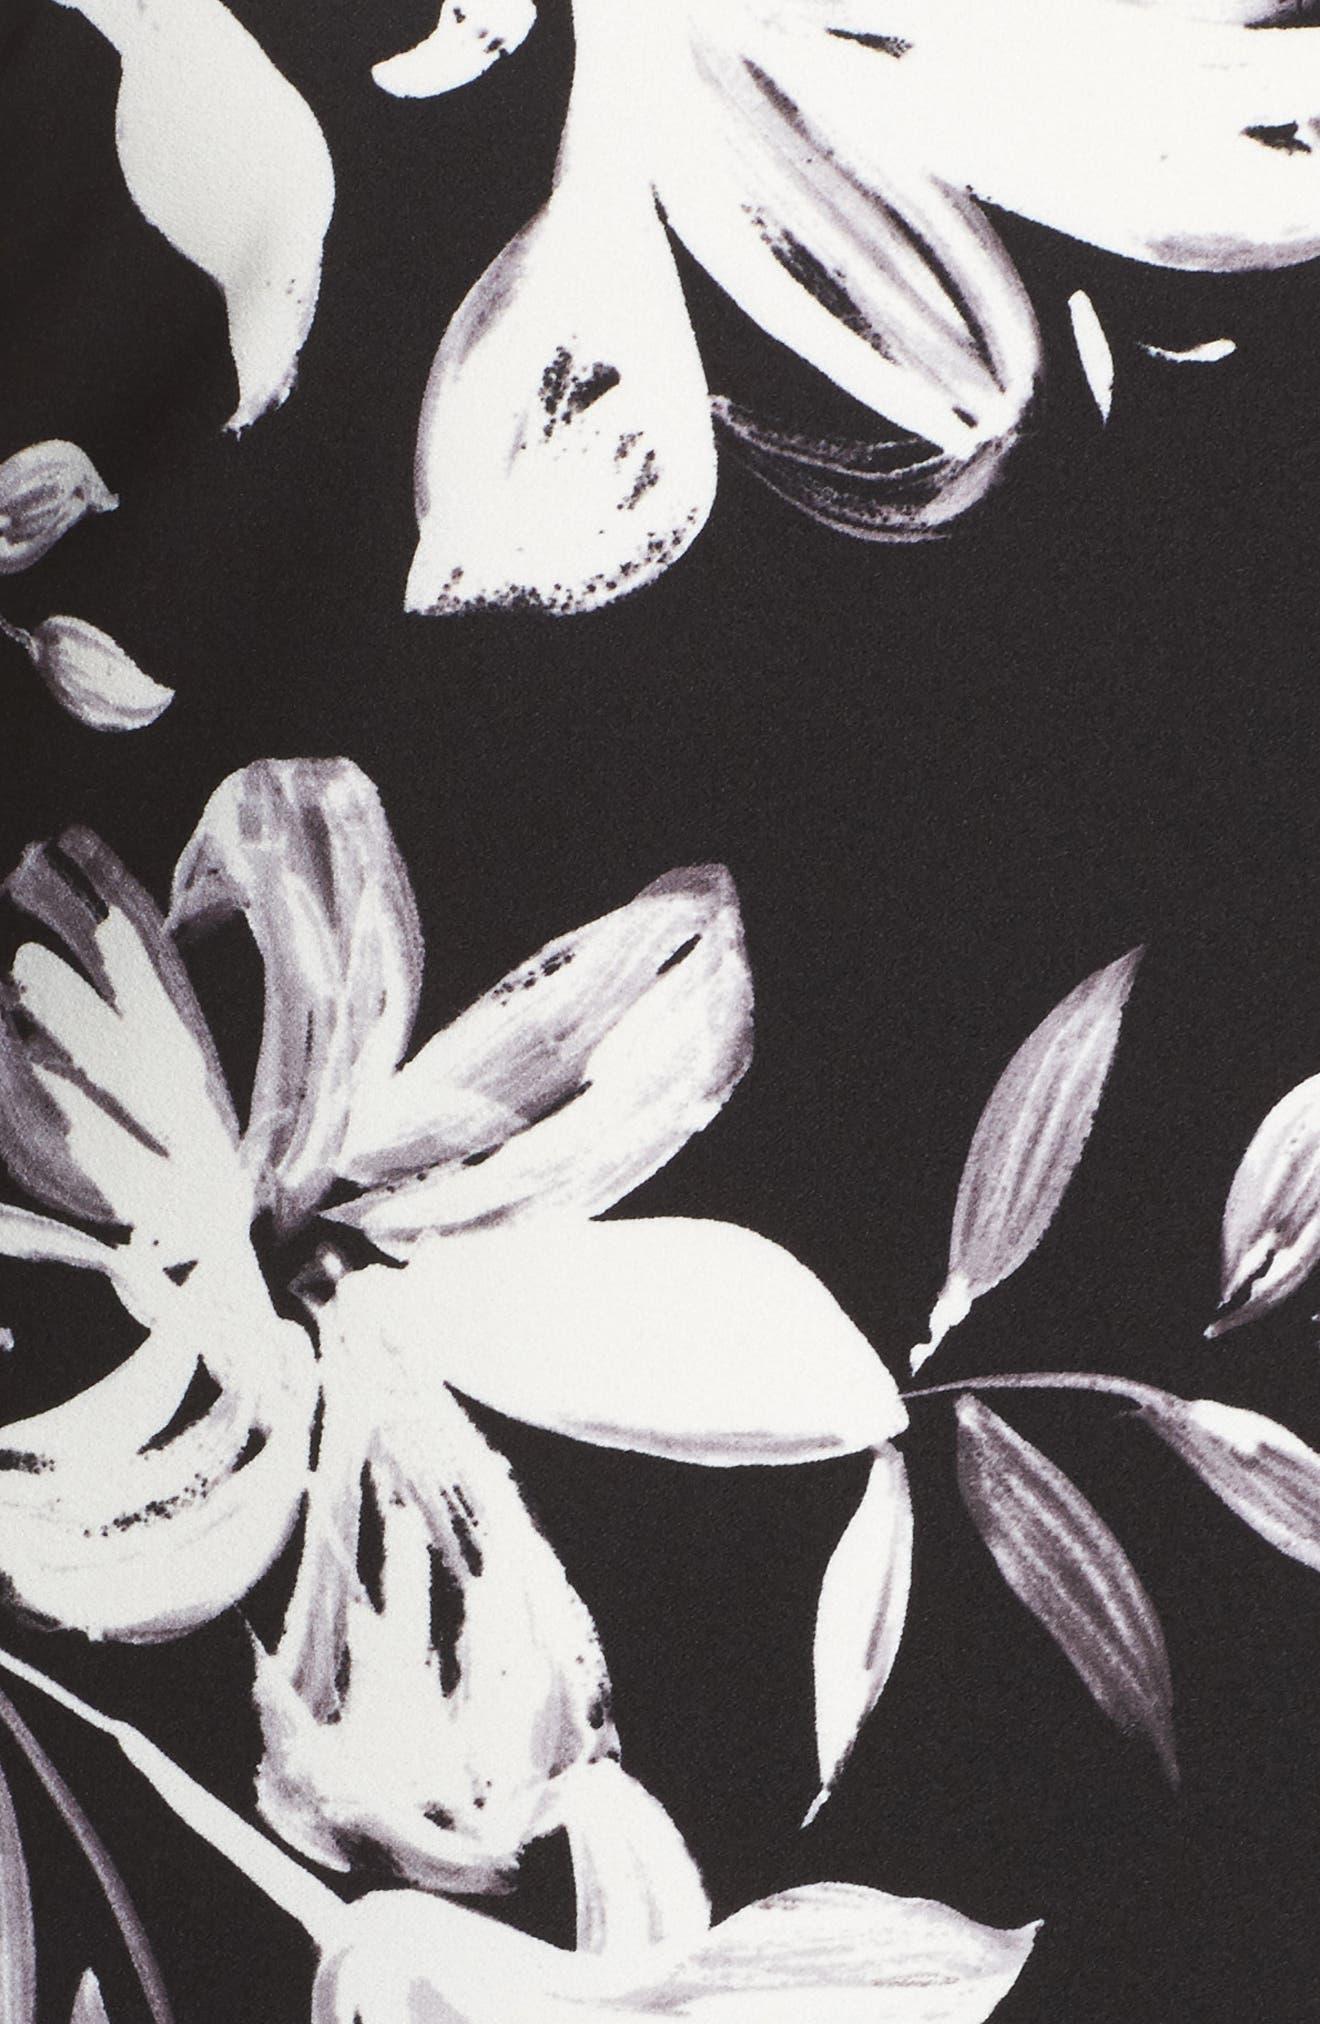 Flare Sleeve Shift Dress,                             Alternate thumbnail 5, color,                             Black/ Ivory